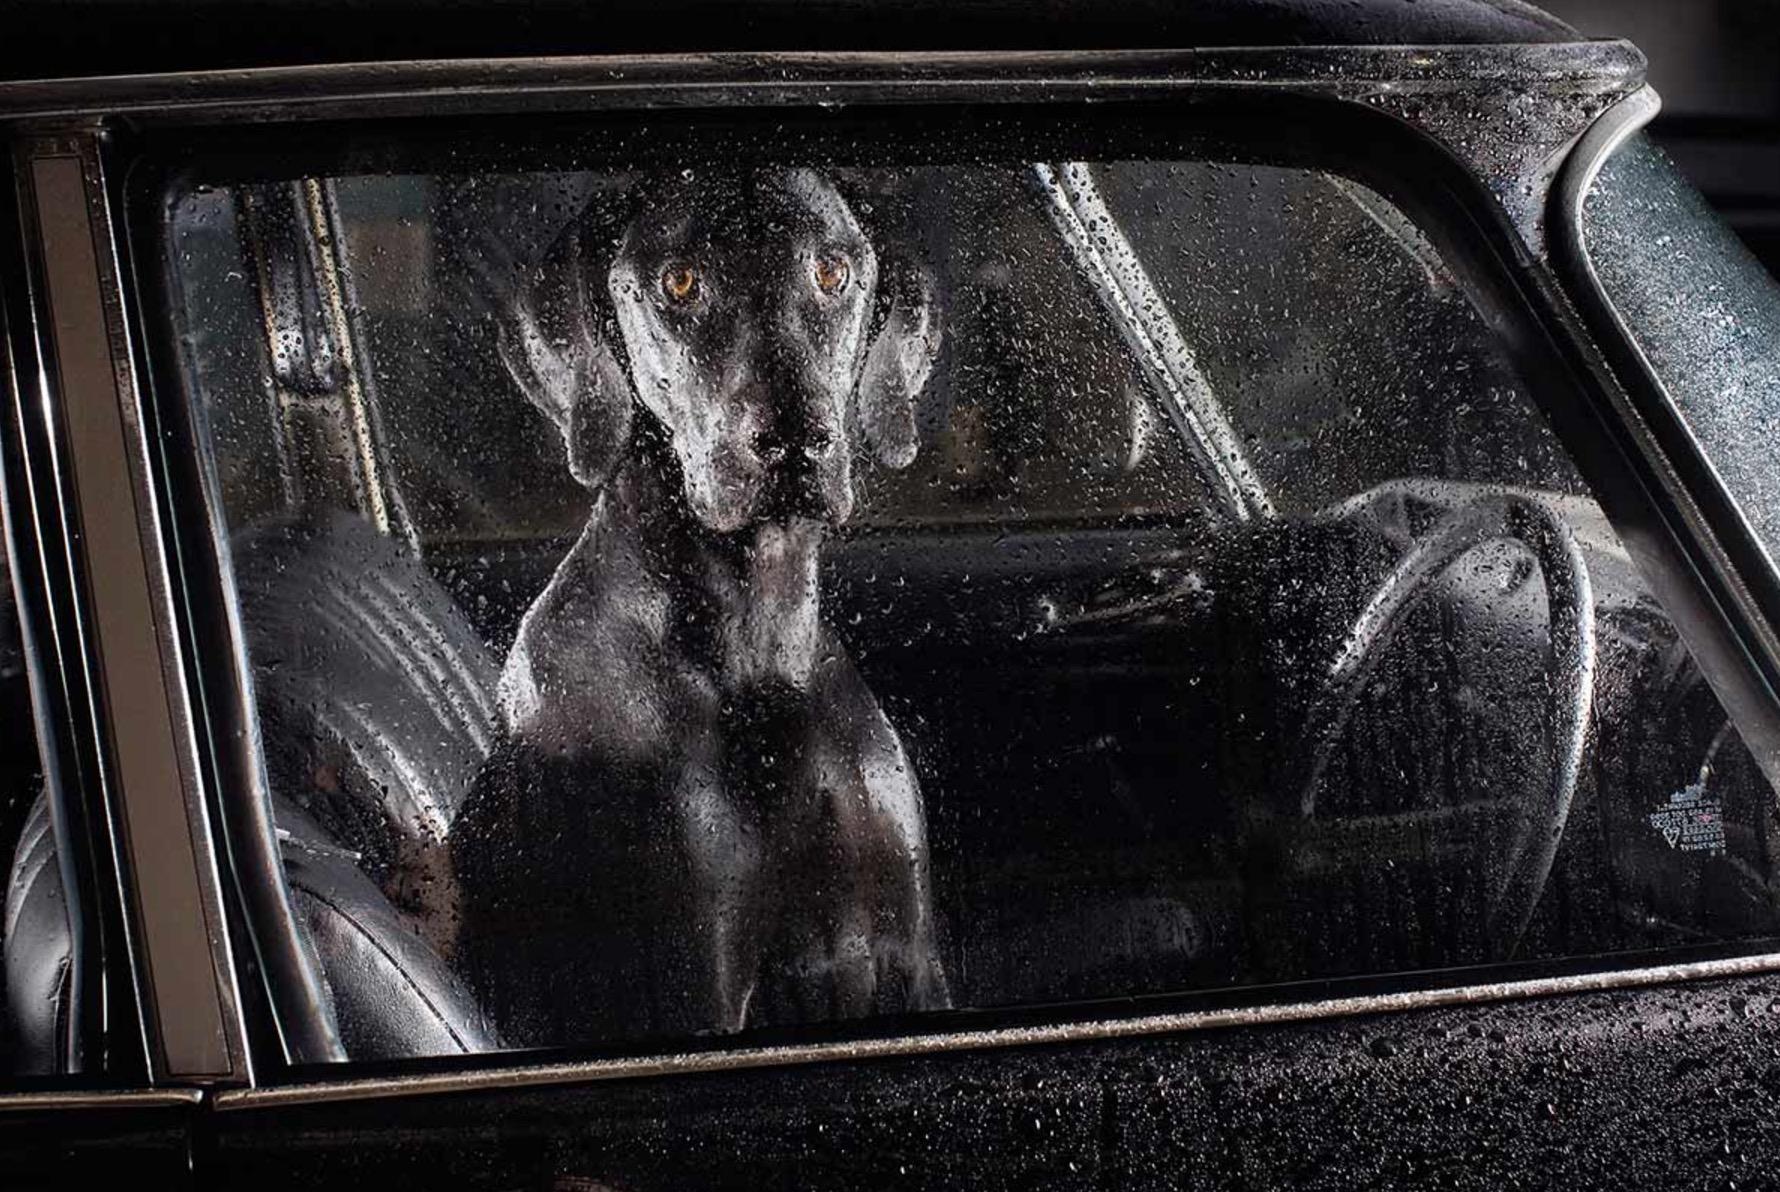 Martin-Usborne-photographe-chiens-voitures-4